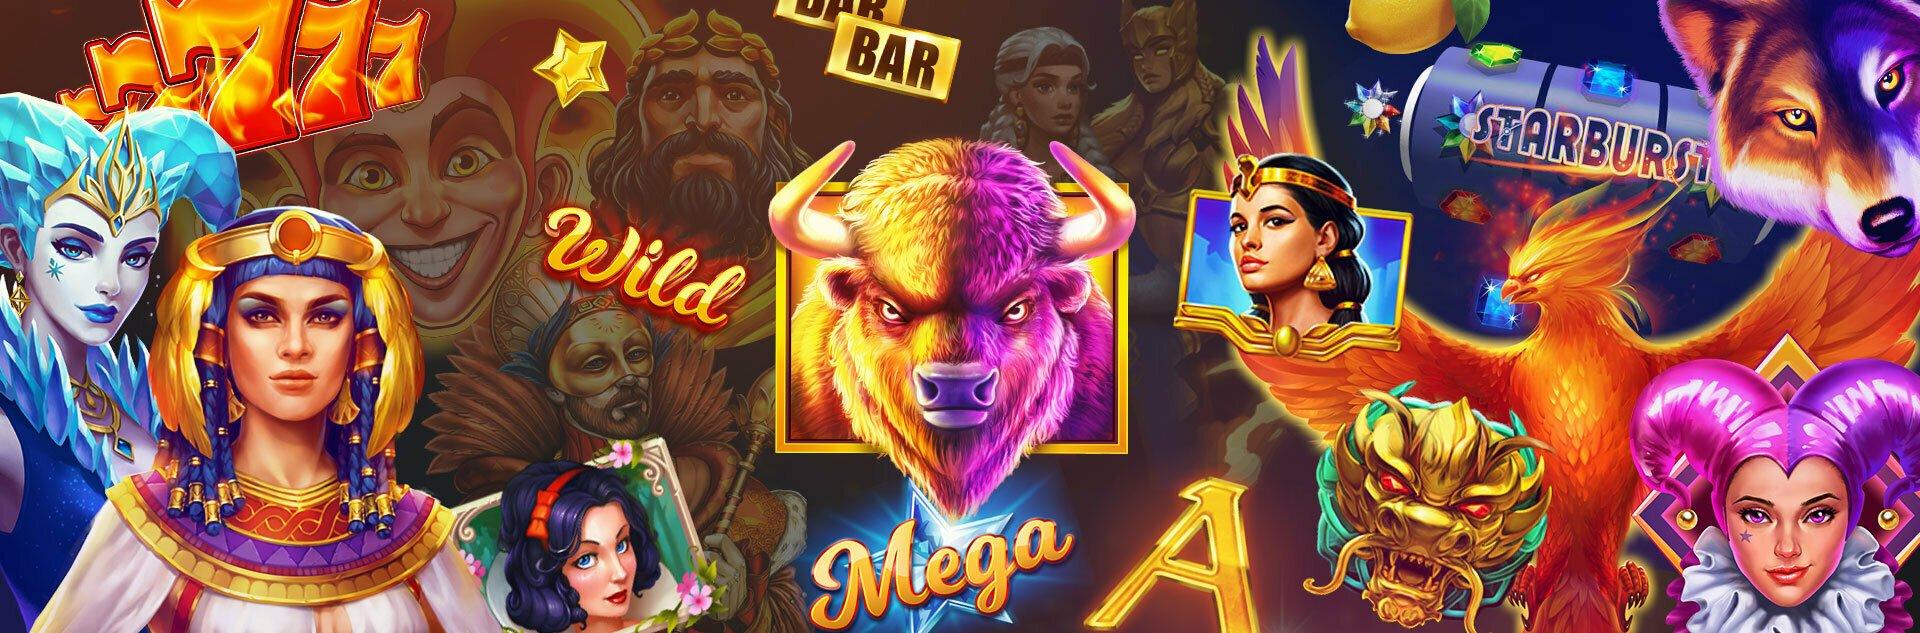 HeySpin  casino review NZ